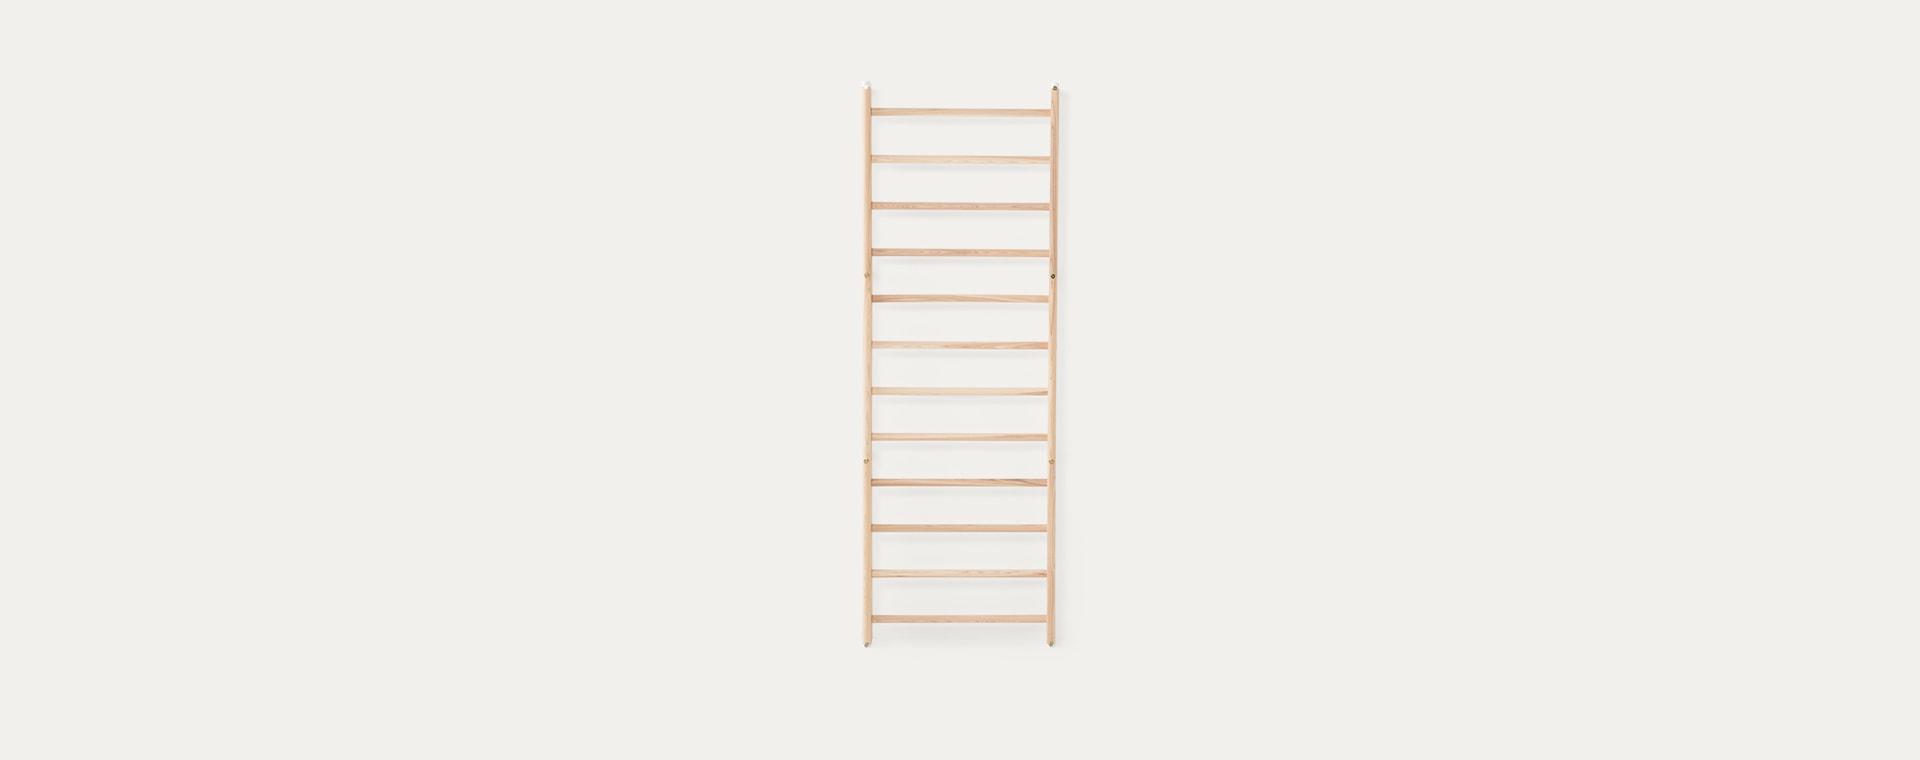 Ash KAOS Endeløs Vertical Set Up Wall Bars